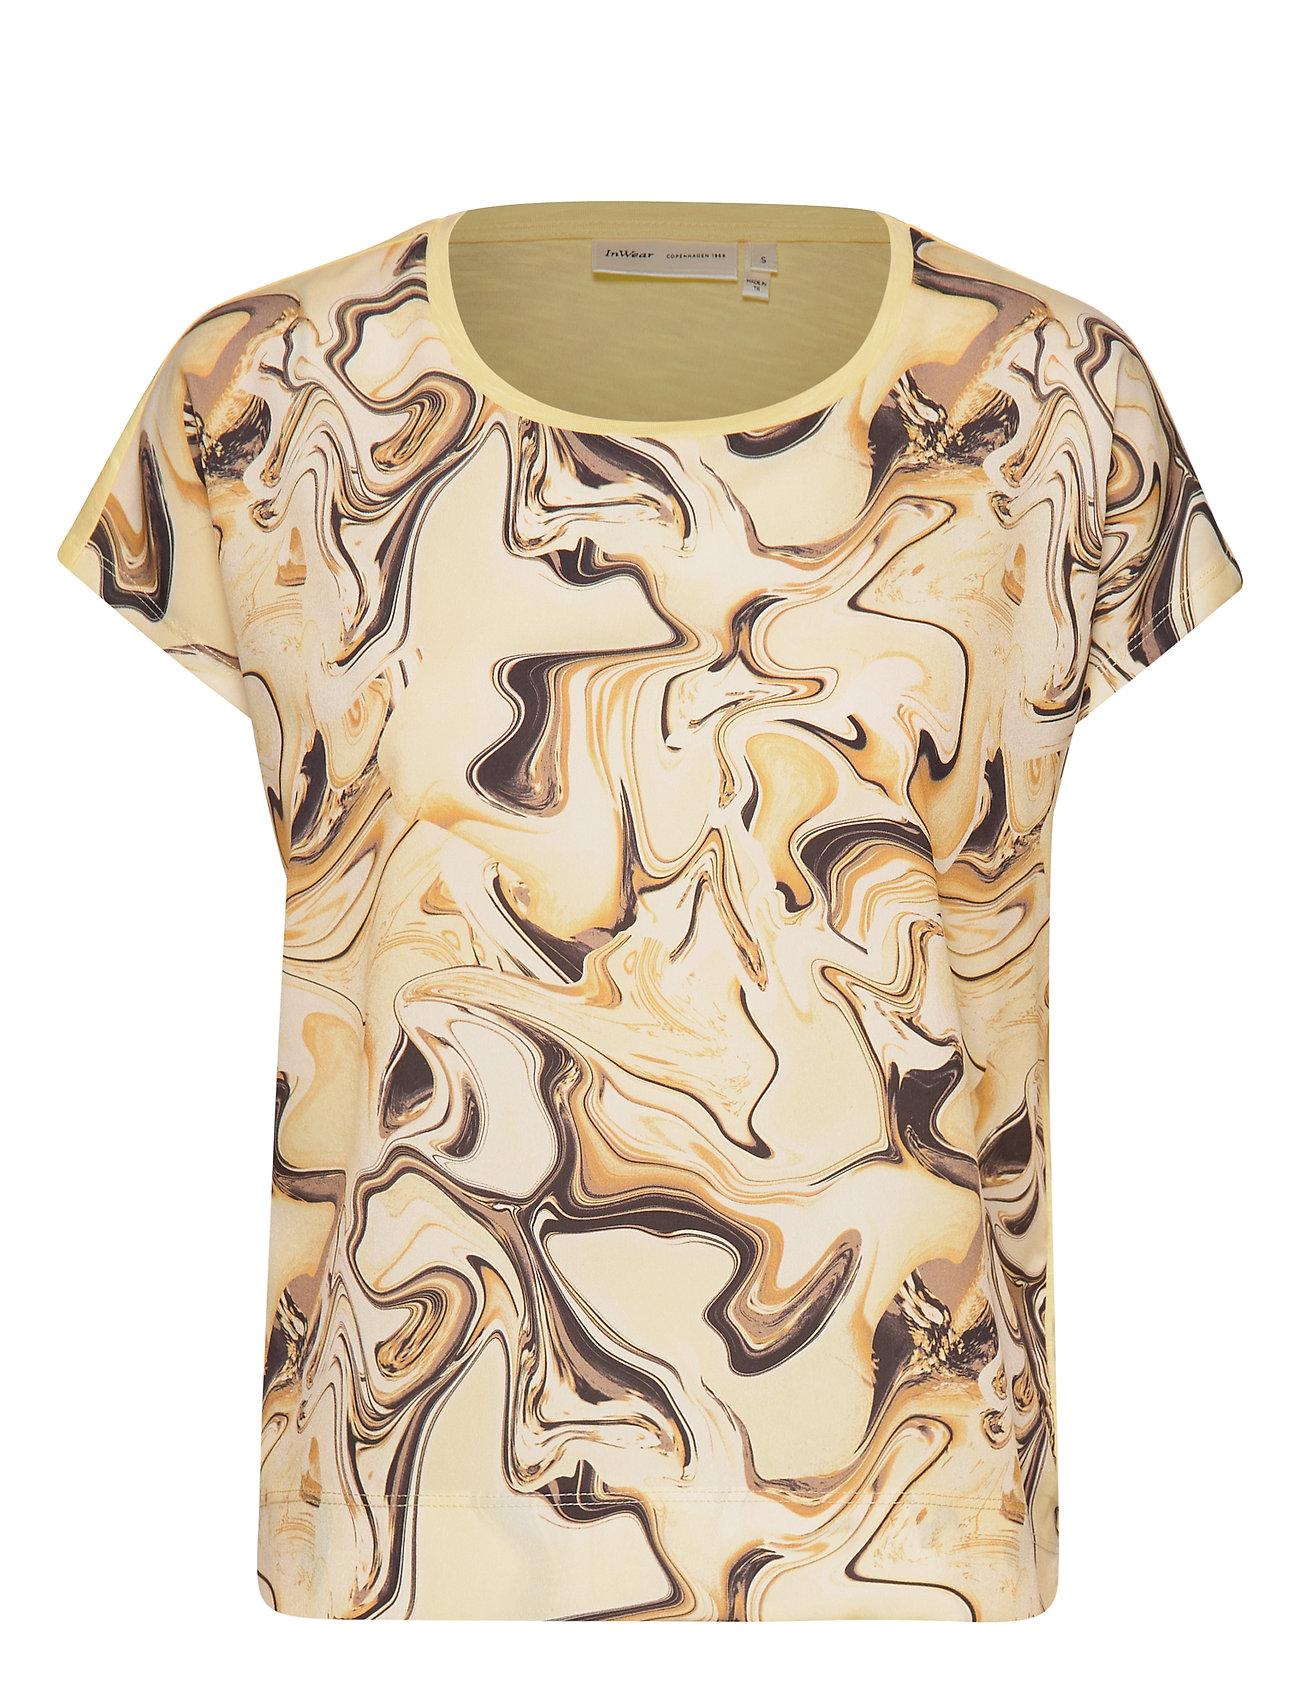 InWear Sicily Tshirt - YELLOW MARBLING